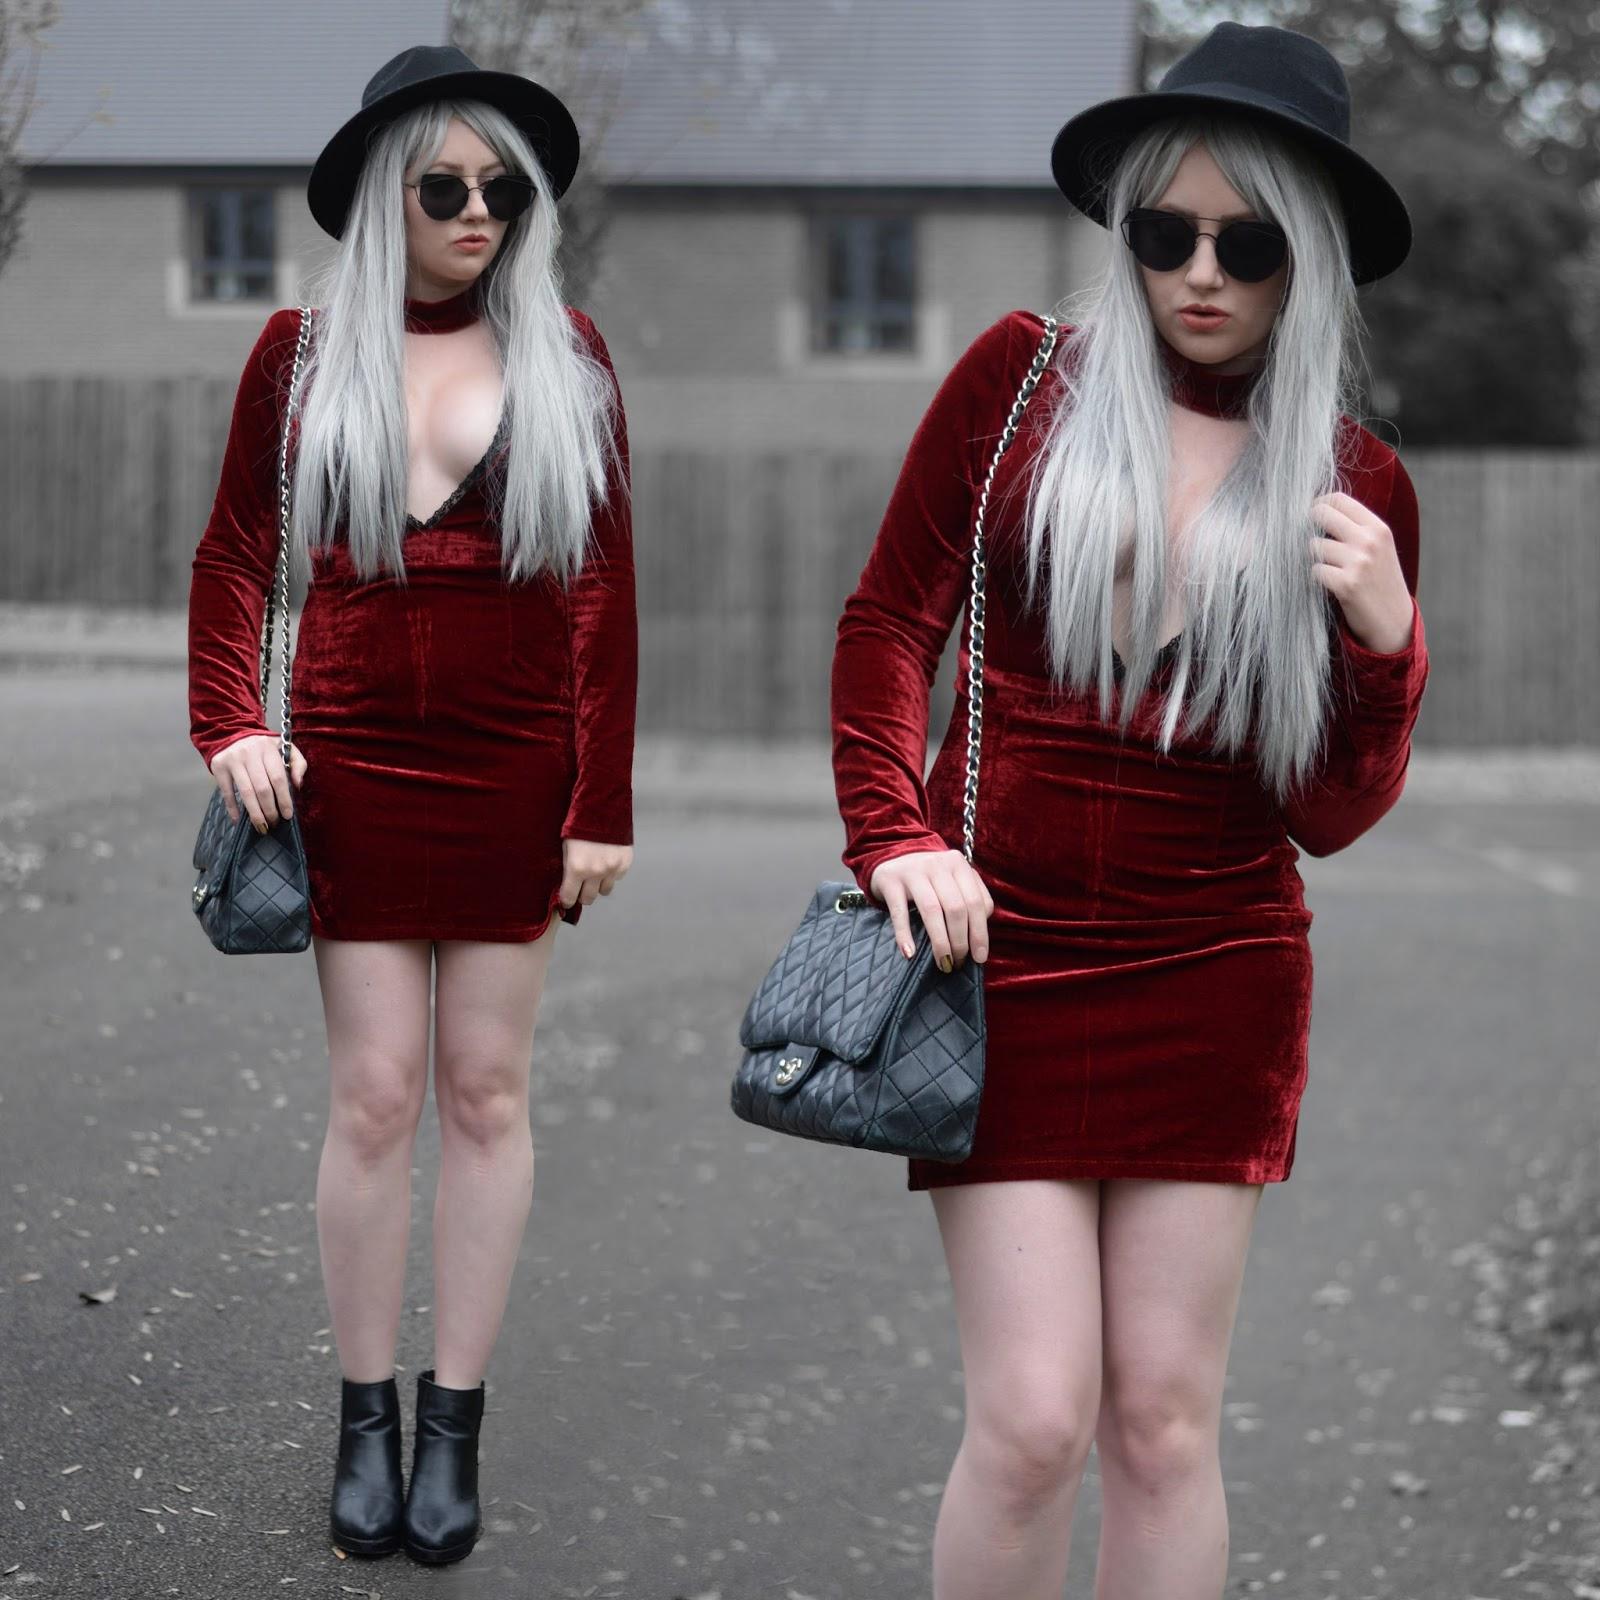 e4423dbfed03b Sammi Jackson - Irisie Burgundy Wine Red Choker Plunge Neck Bodycon Velvet  Lace Dress